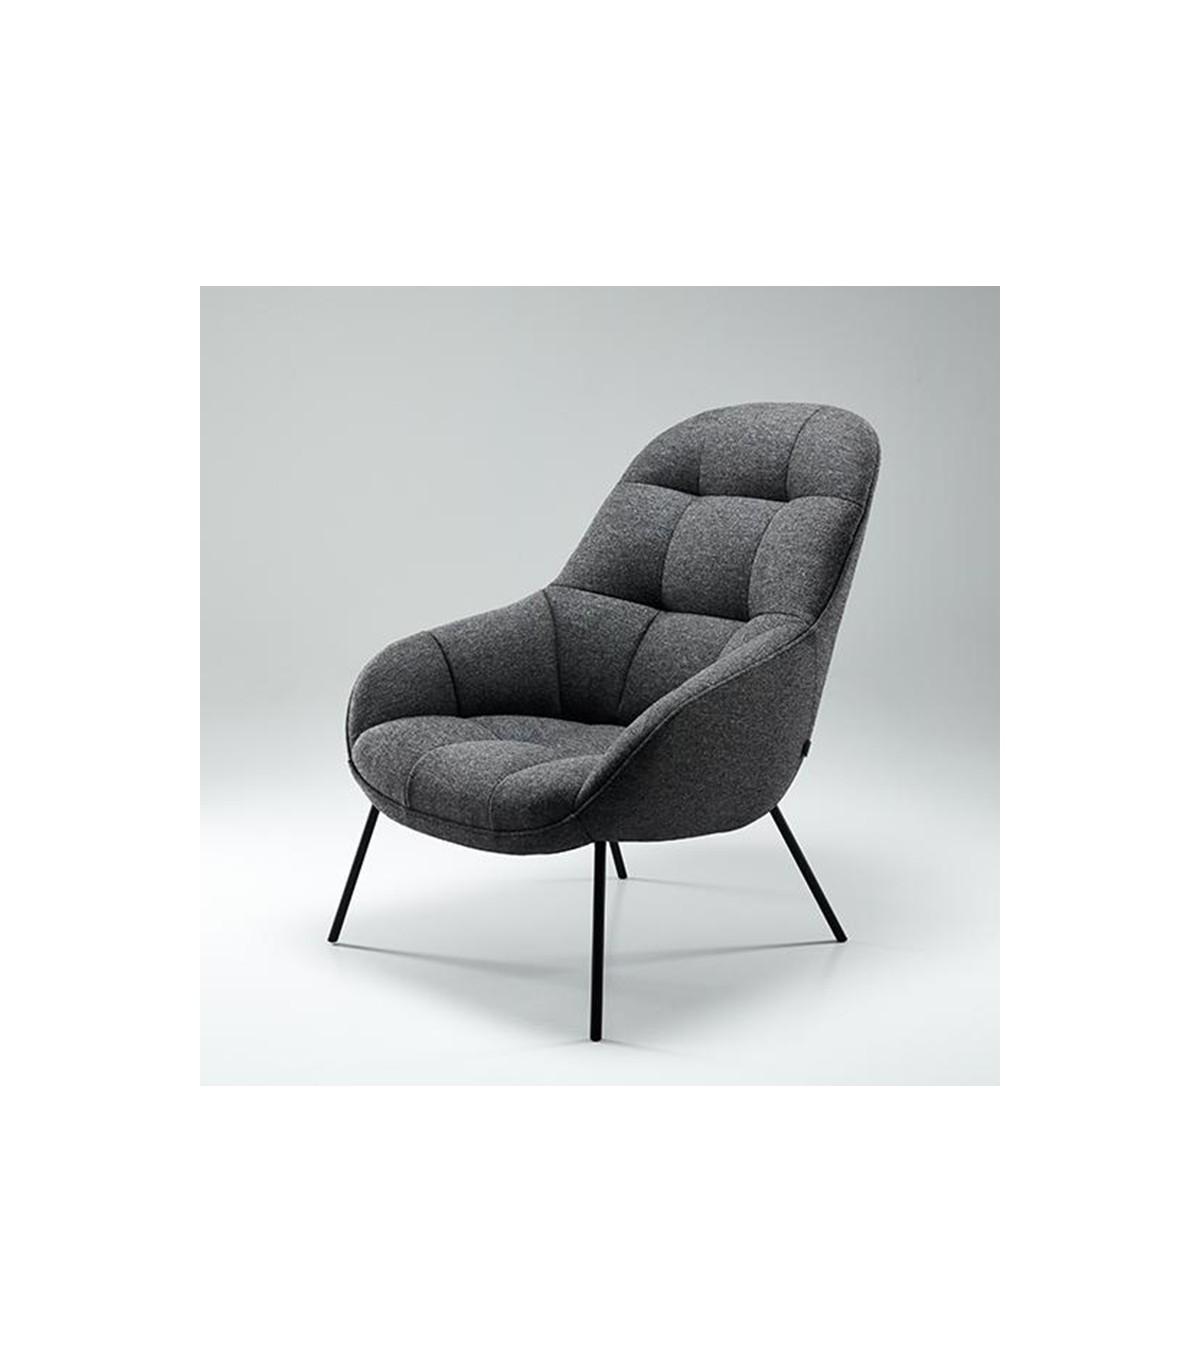 mango chair won design